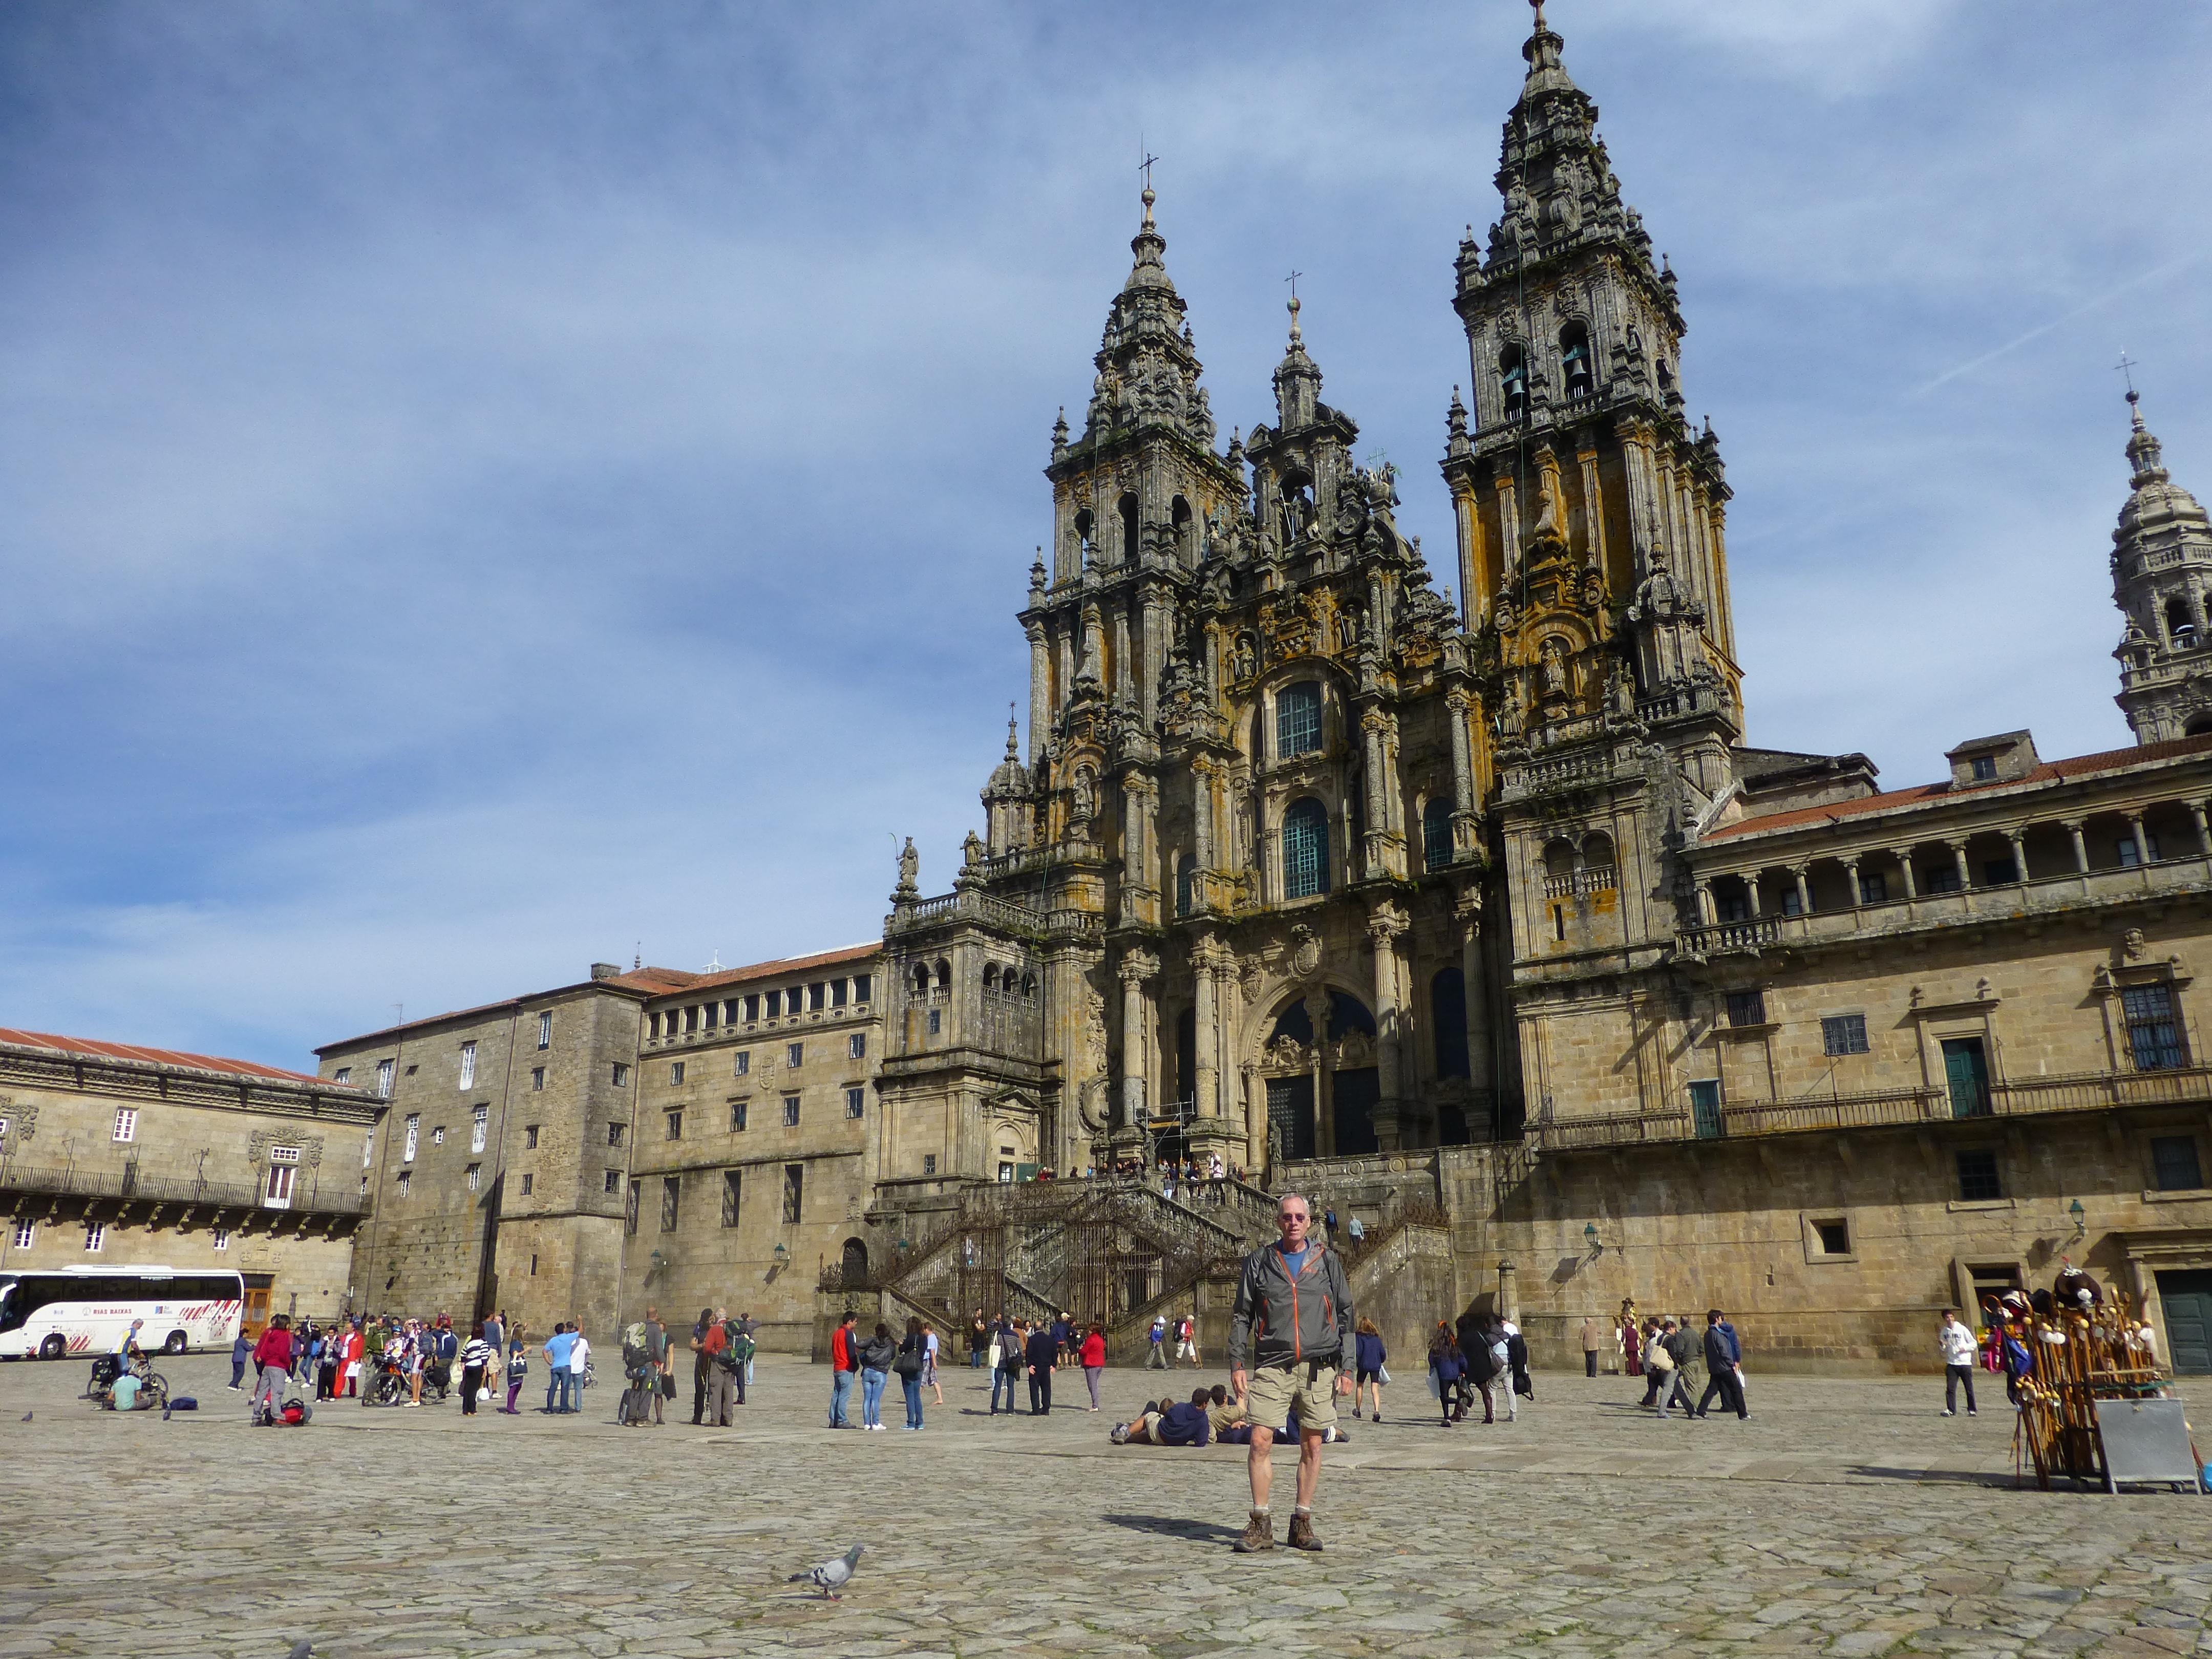 Day 29 – Santiago de Compostela (3.6 mi / 6 km ...